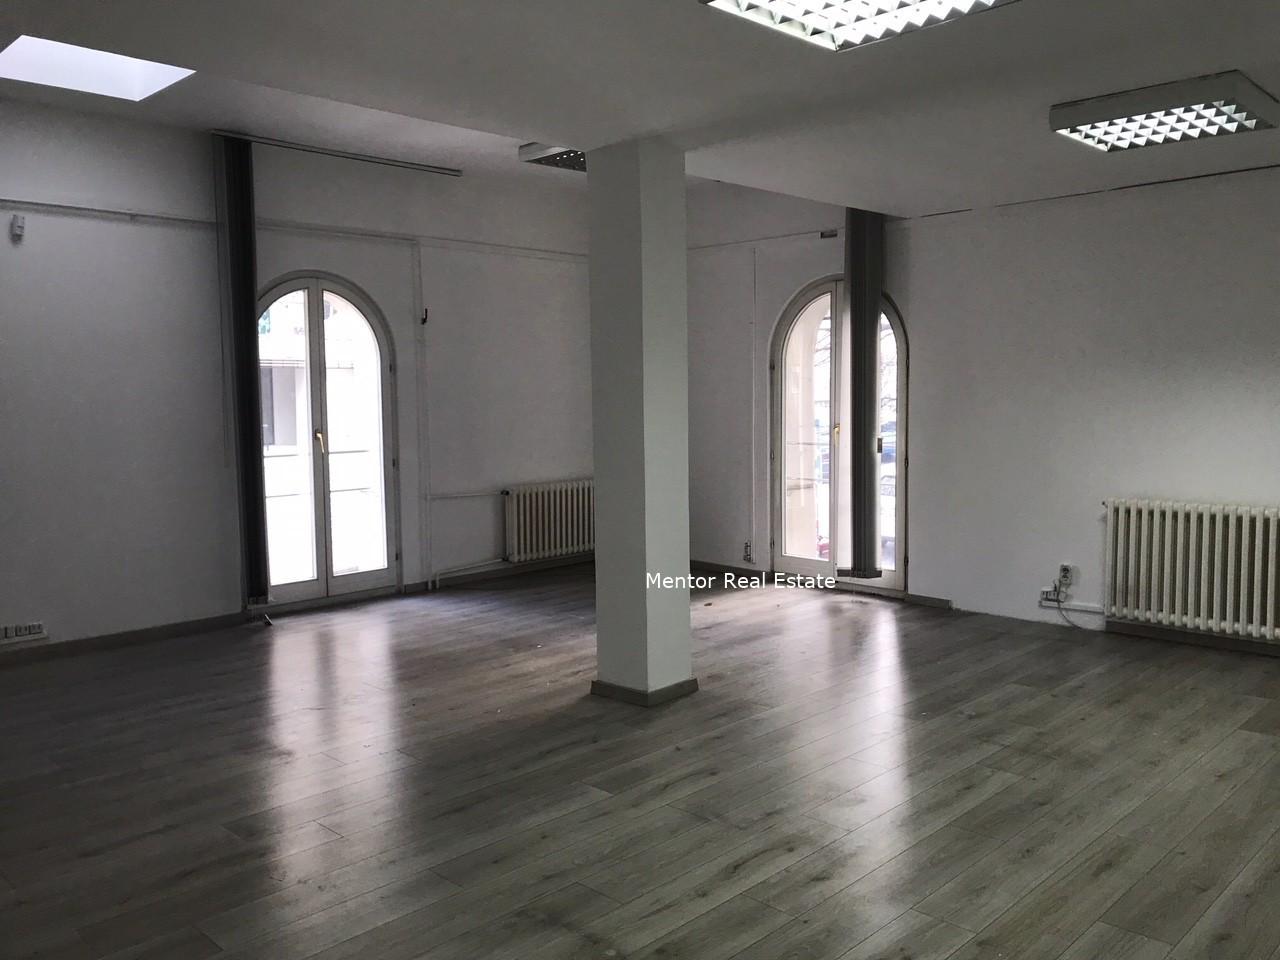 Stari Grad office space 270sqm for rent